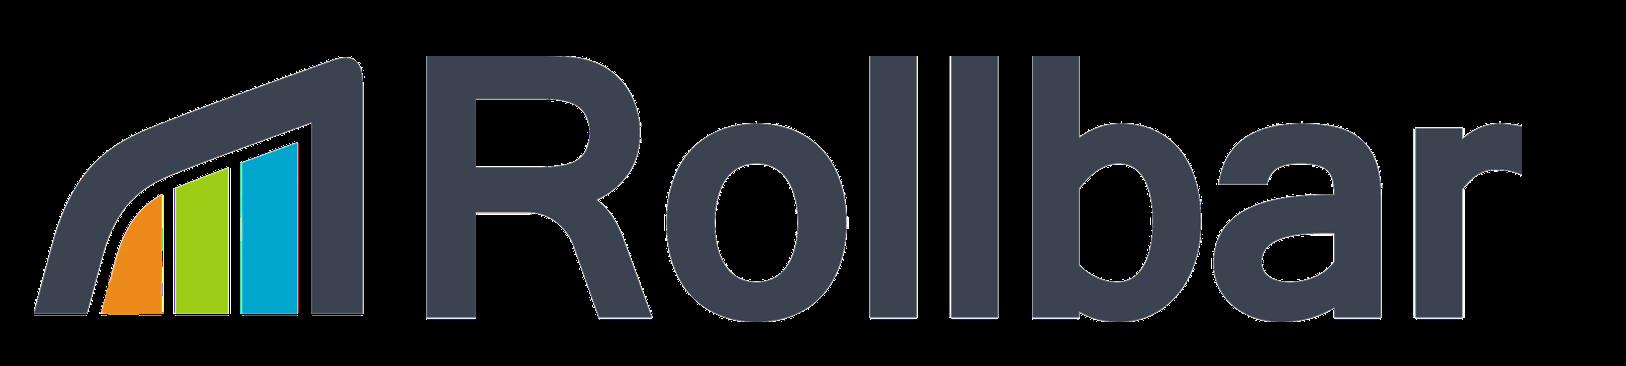 Rollbarlogo